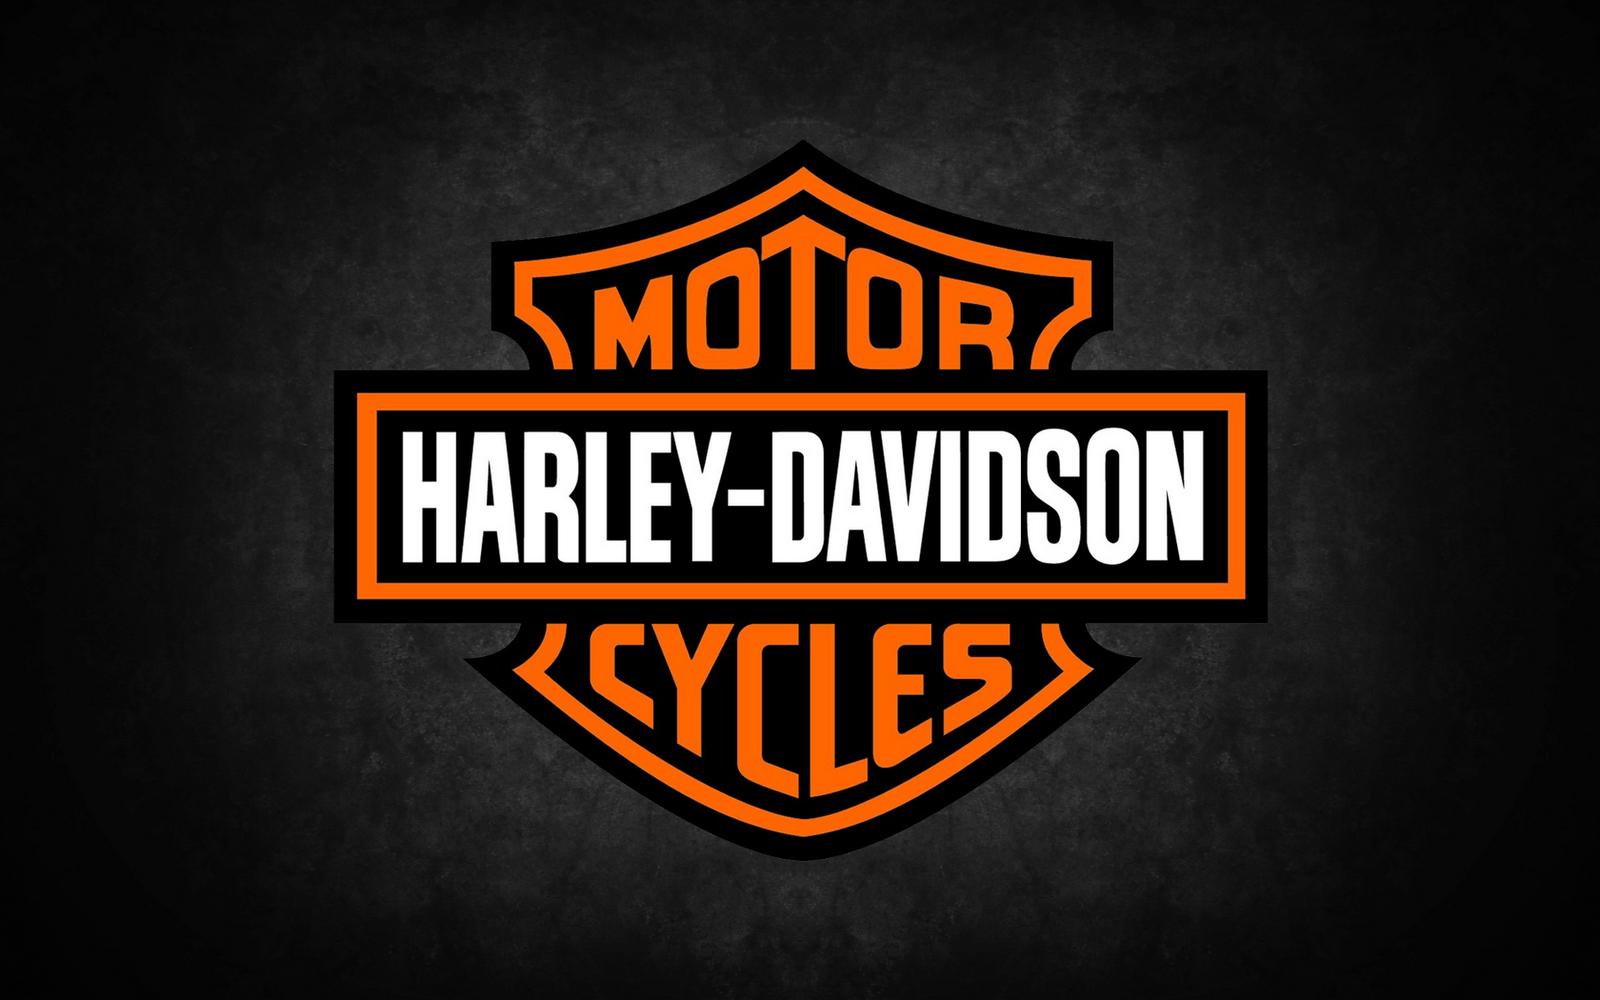 Harley Davidson Logo Exclusive HD Wallpapers 1932 1600x1000